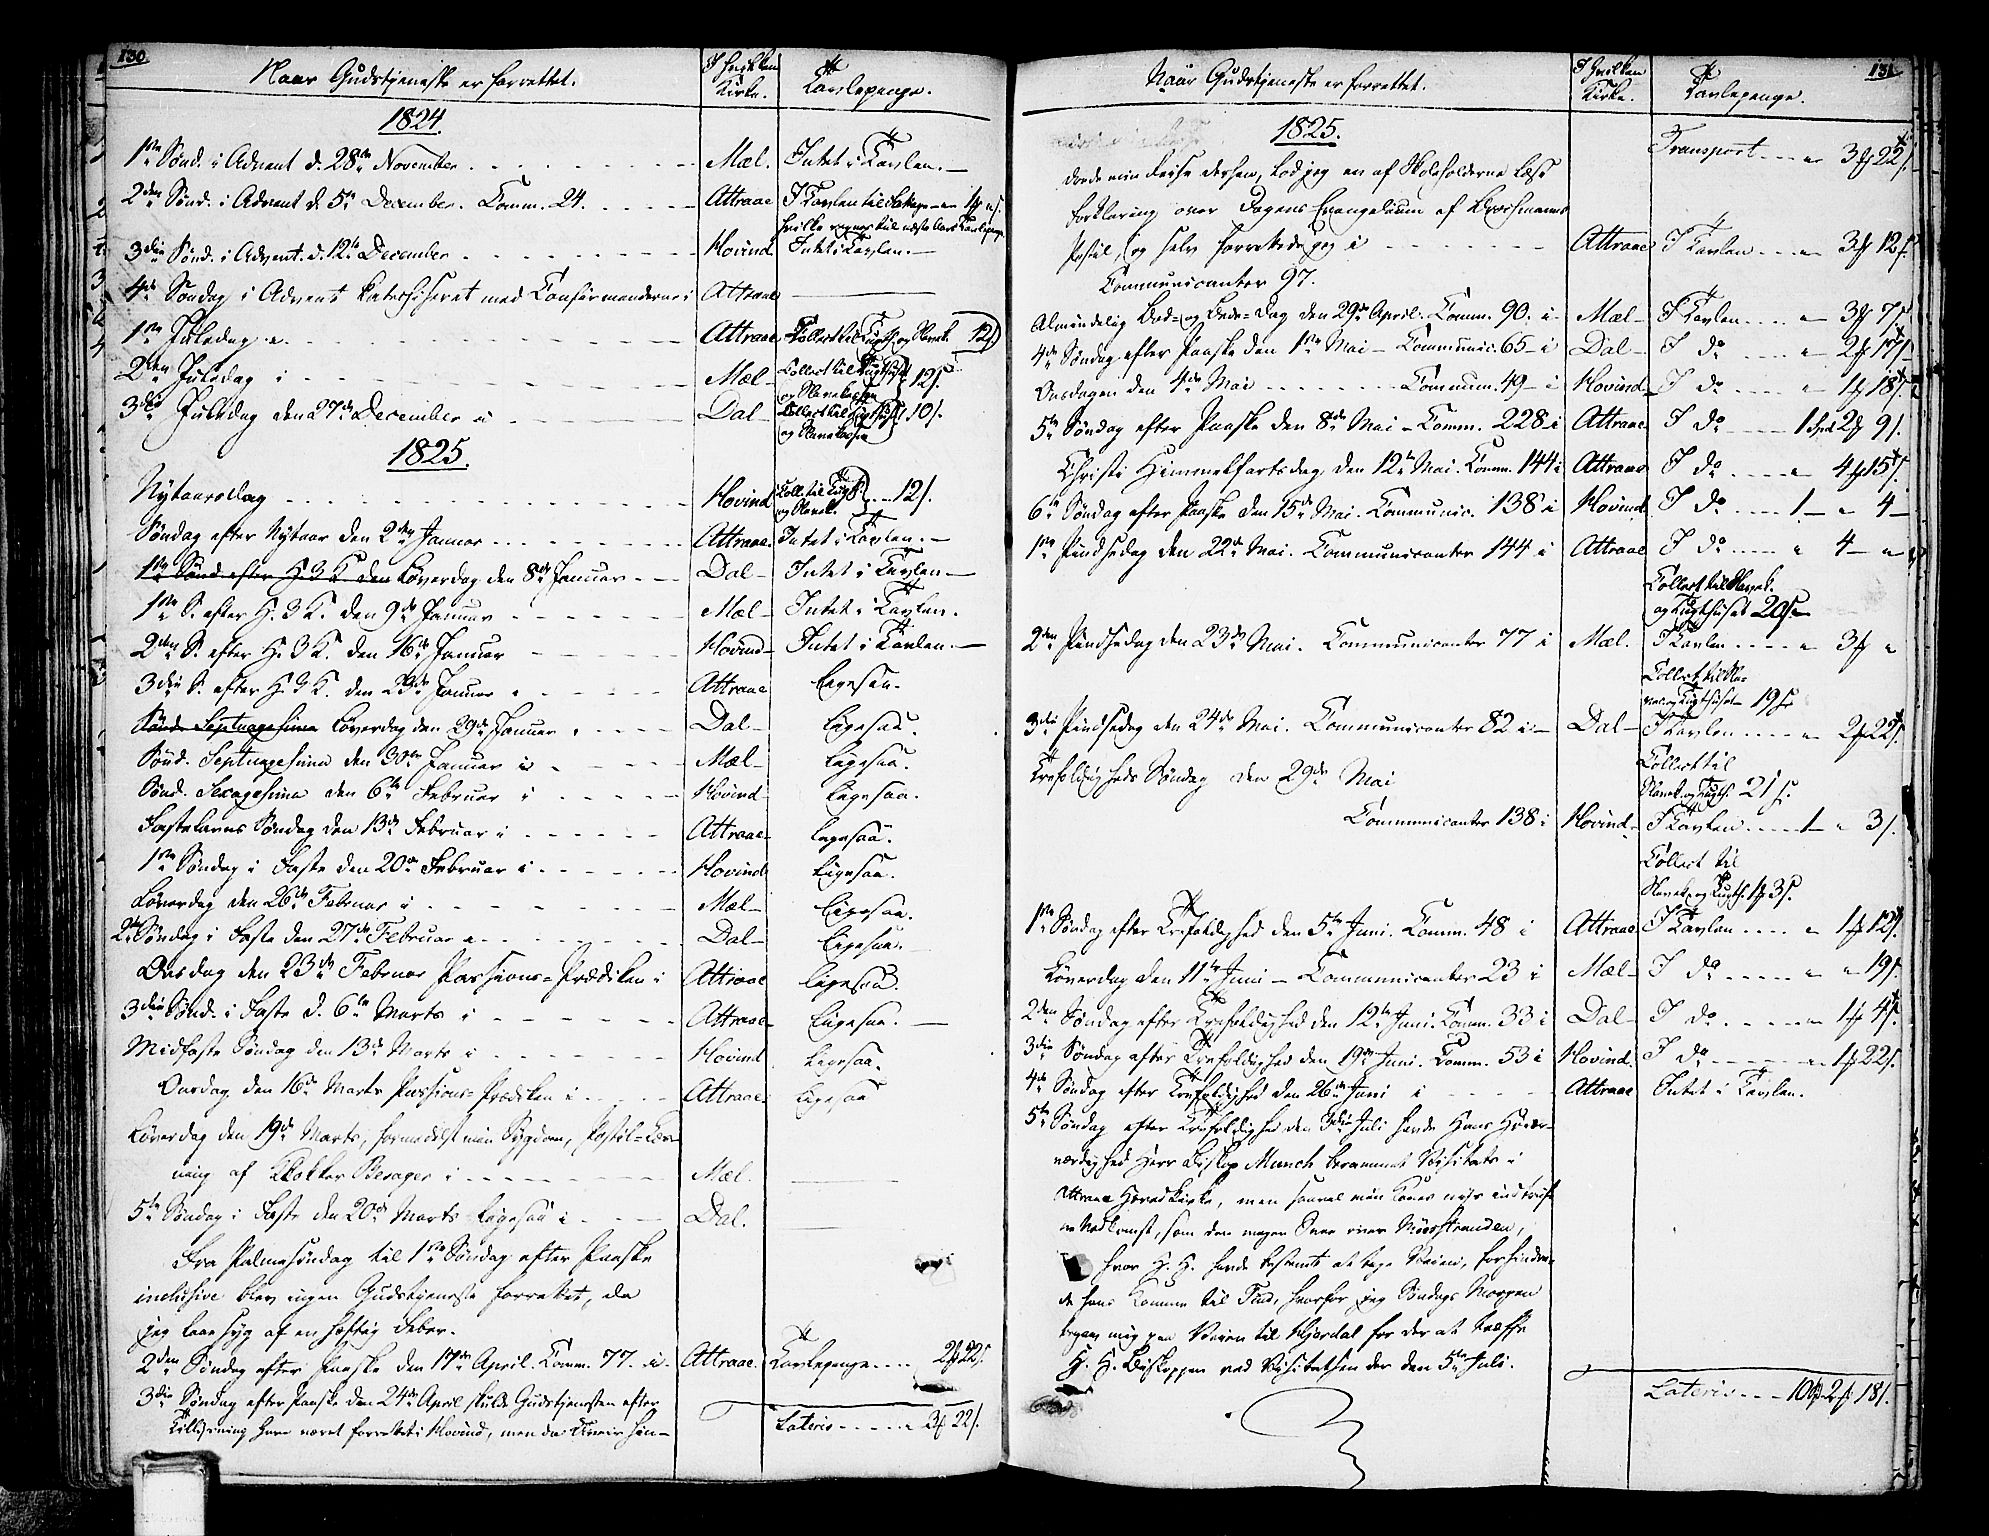 SAKO, Tinn kirkebøker, F/Fa/L0003: Ministerialbok nr. I 3, 1810-1814, s. 130-131